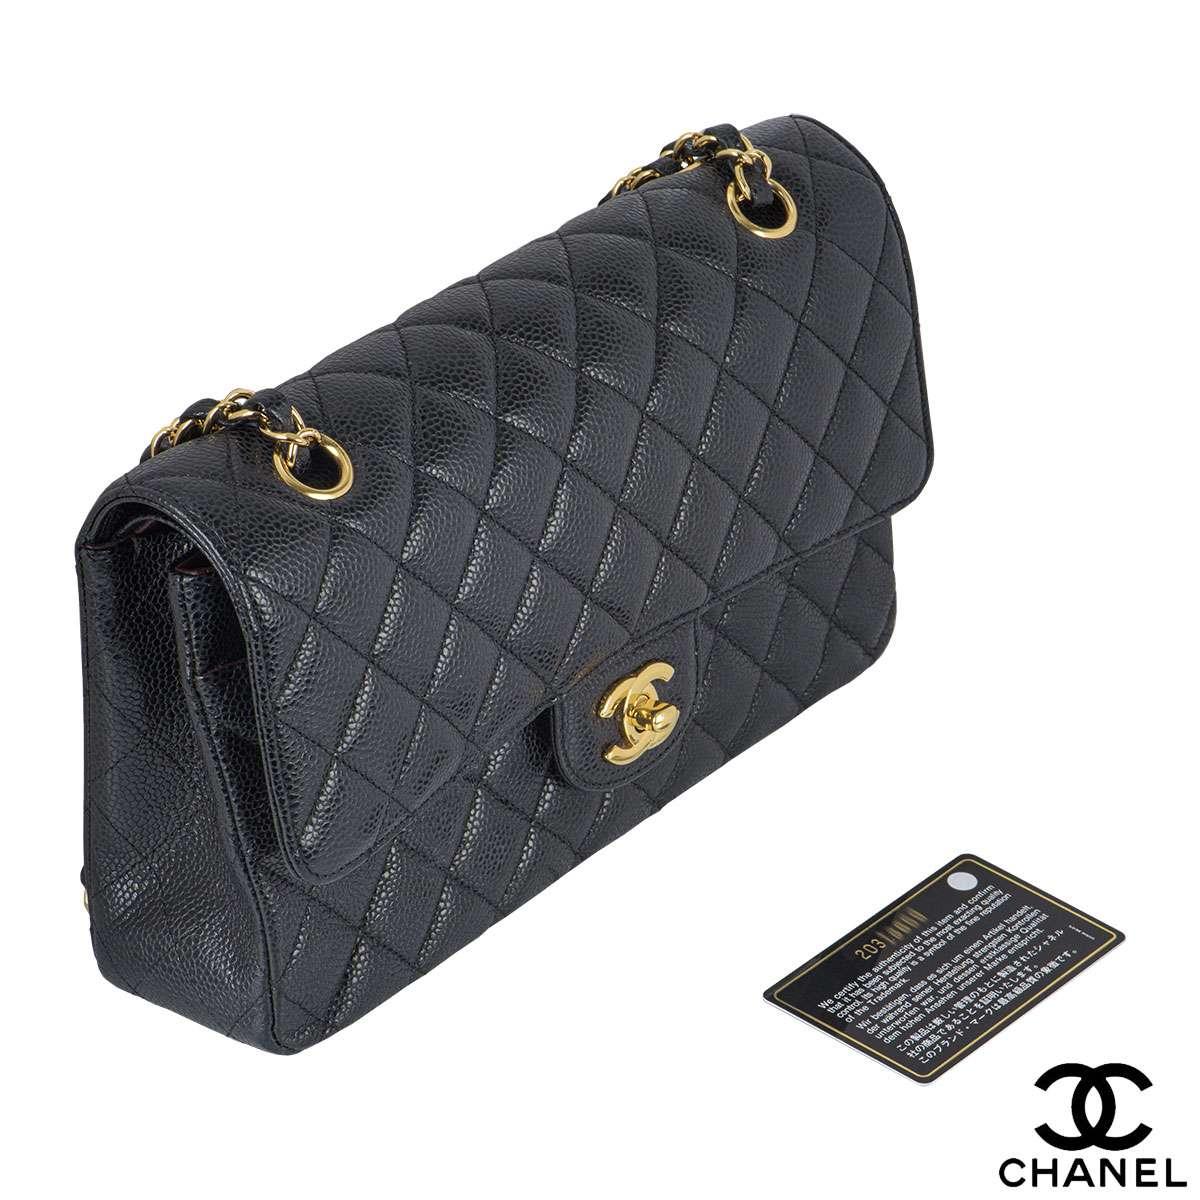 Chanel classic medium flap Handbag